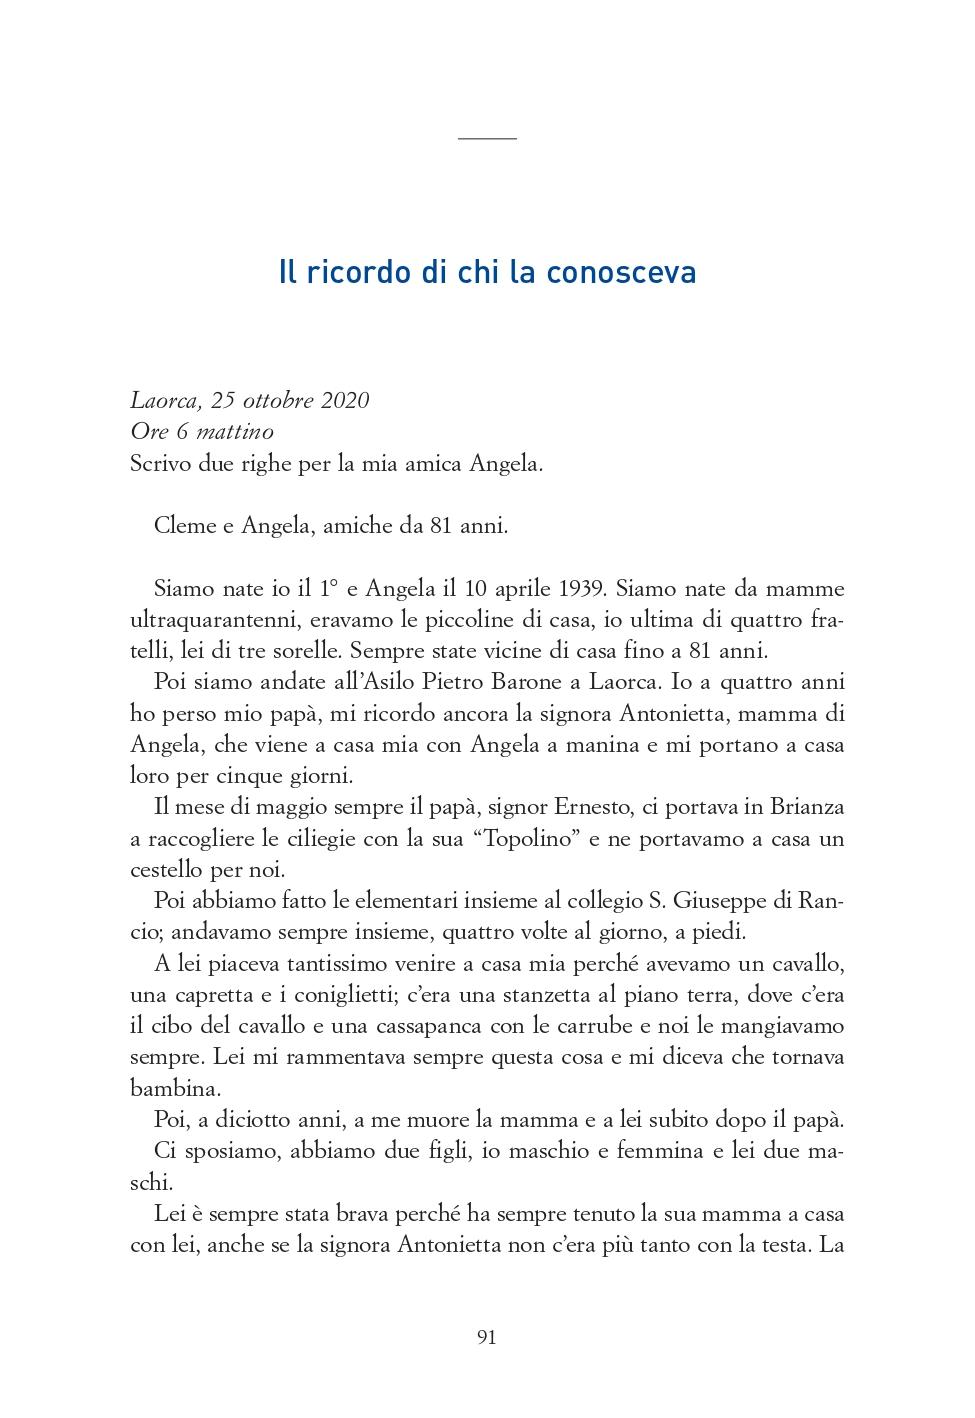 Libro MELES_200 pag_165x240 cm_Febbraio 2021_light_compressed_page-0092